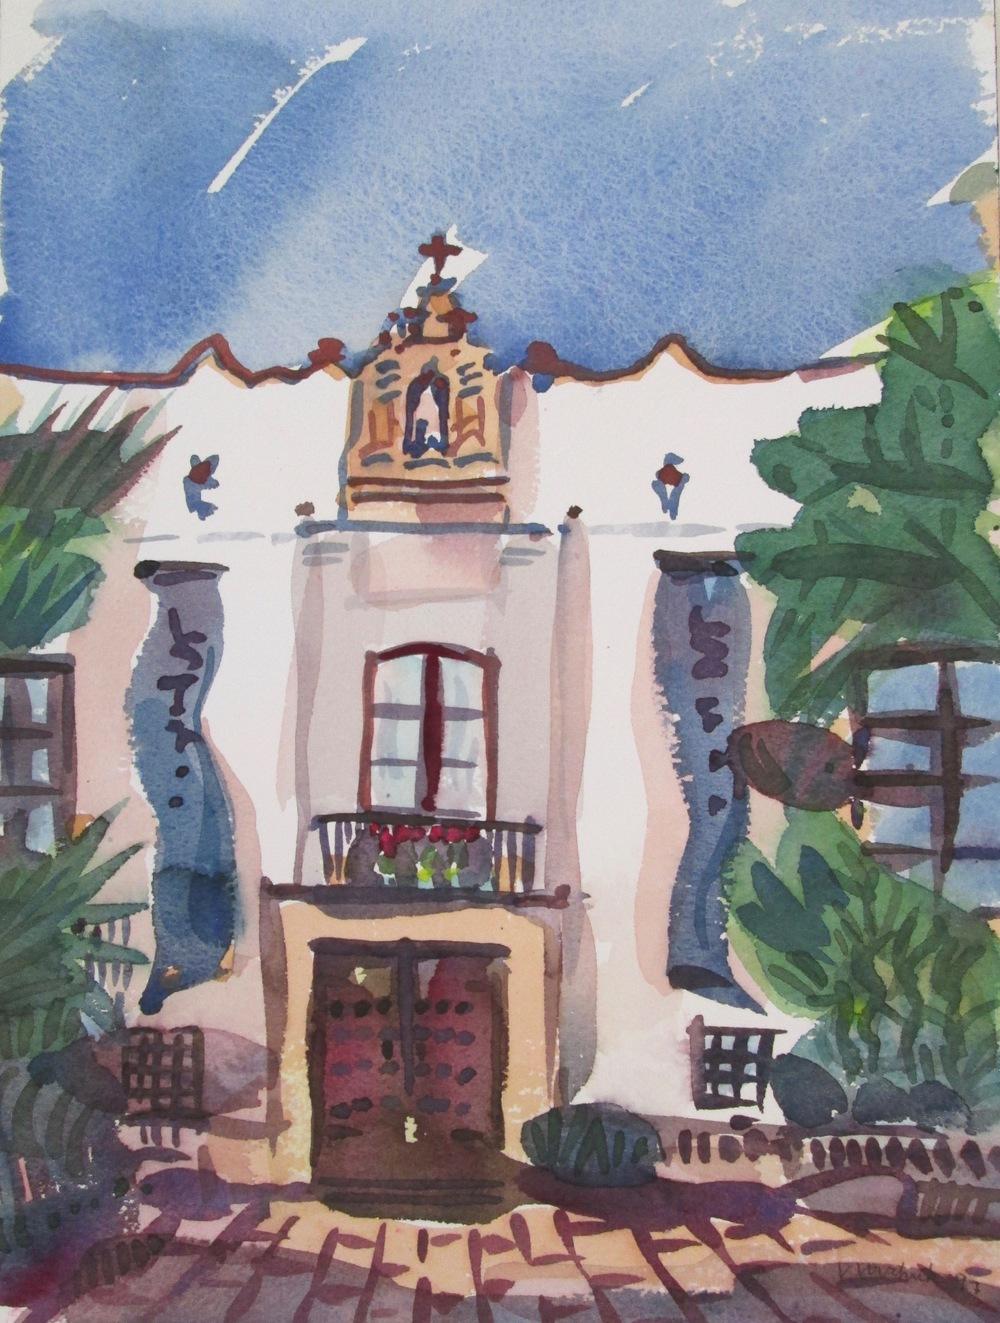 San Angel 02, Mexico City